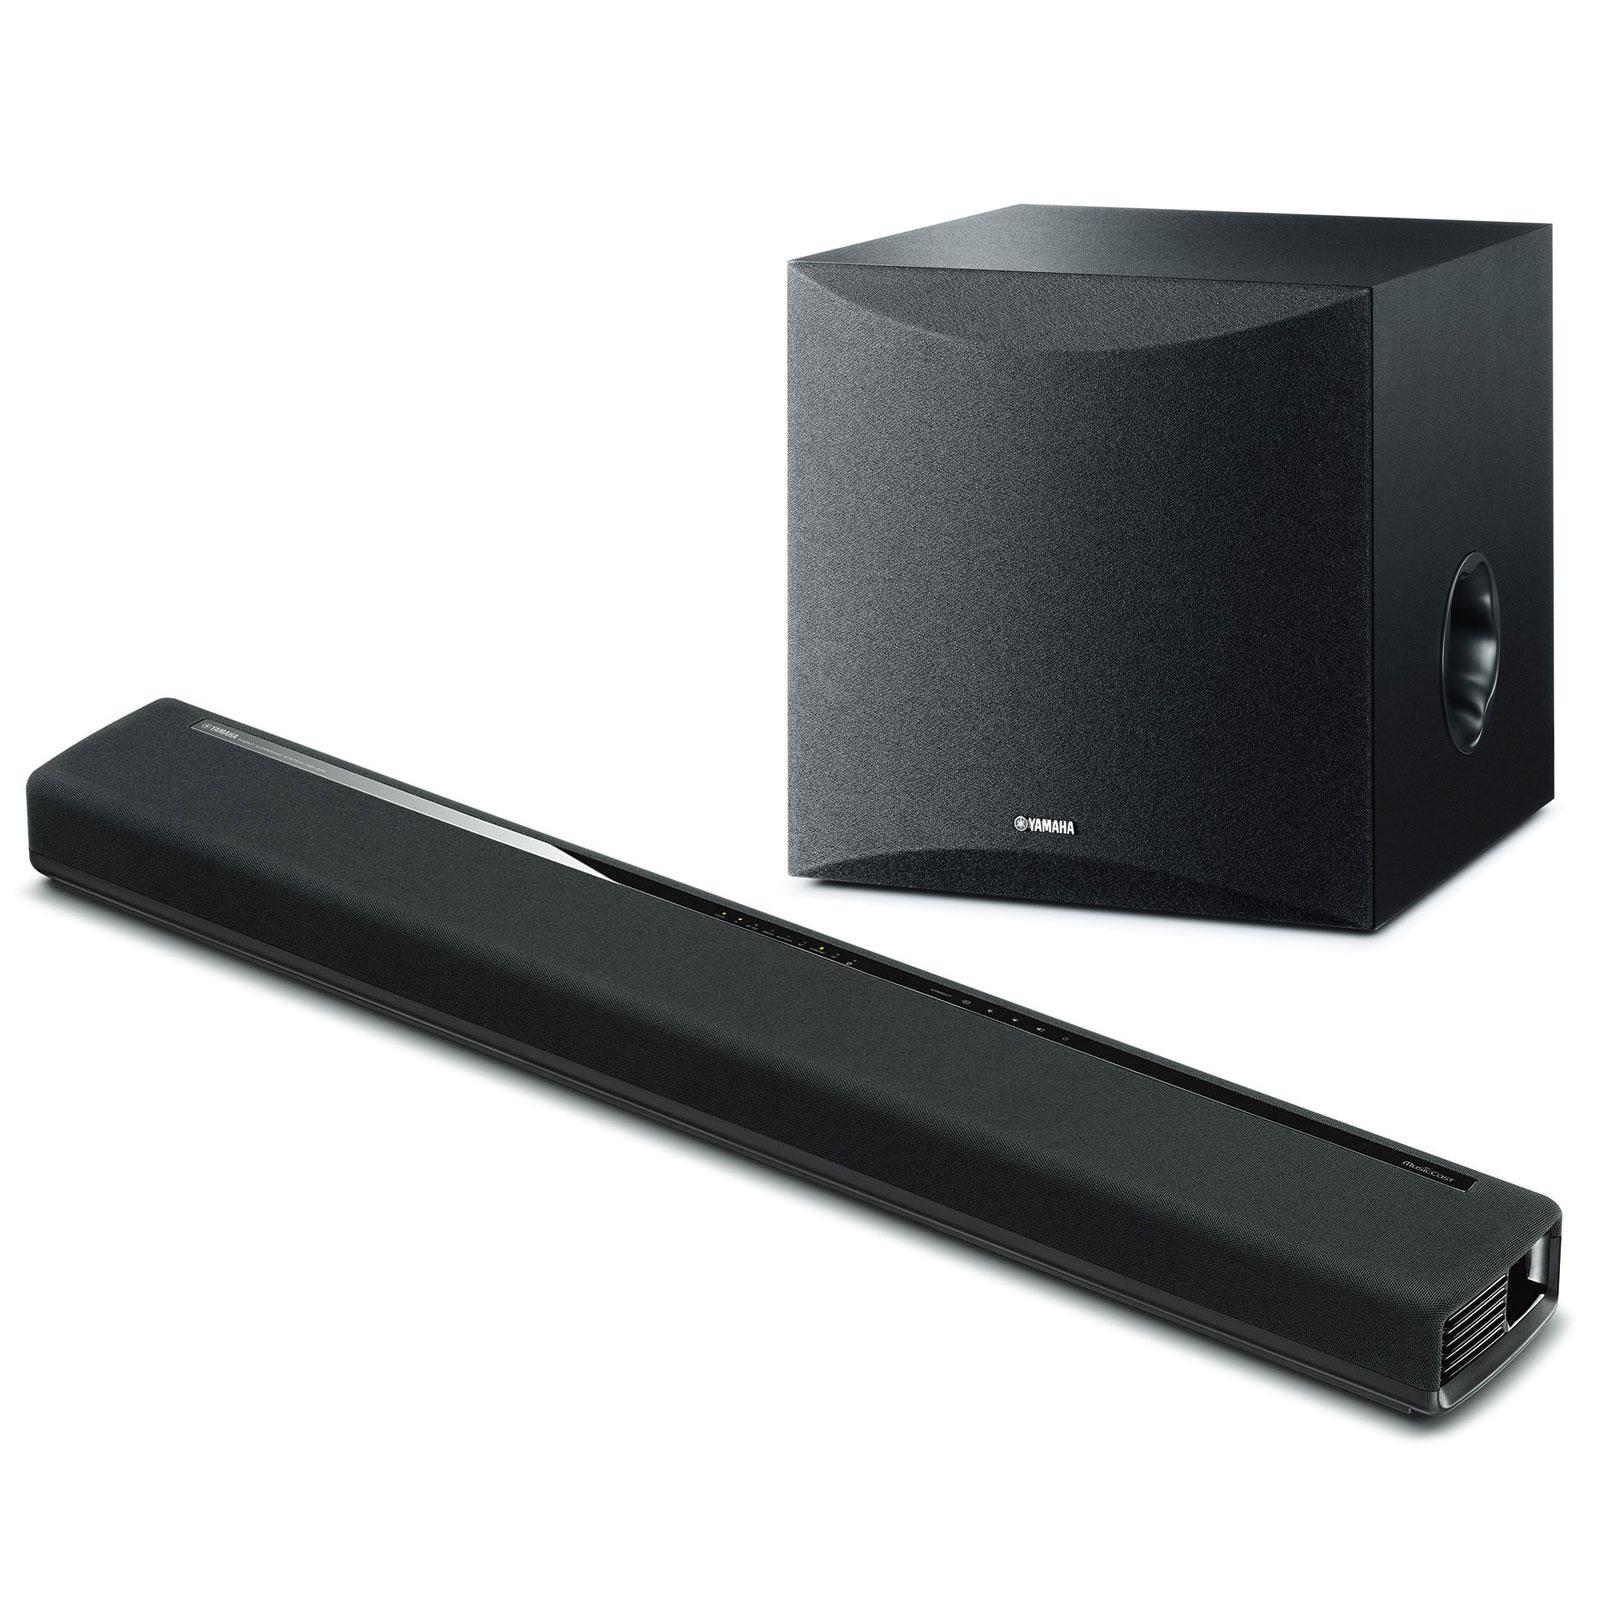 yamaha musiccast yas 306 noir ns sw050 noir barre de. Black Bedroom Furniture Sets. Home Design Ideas